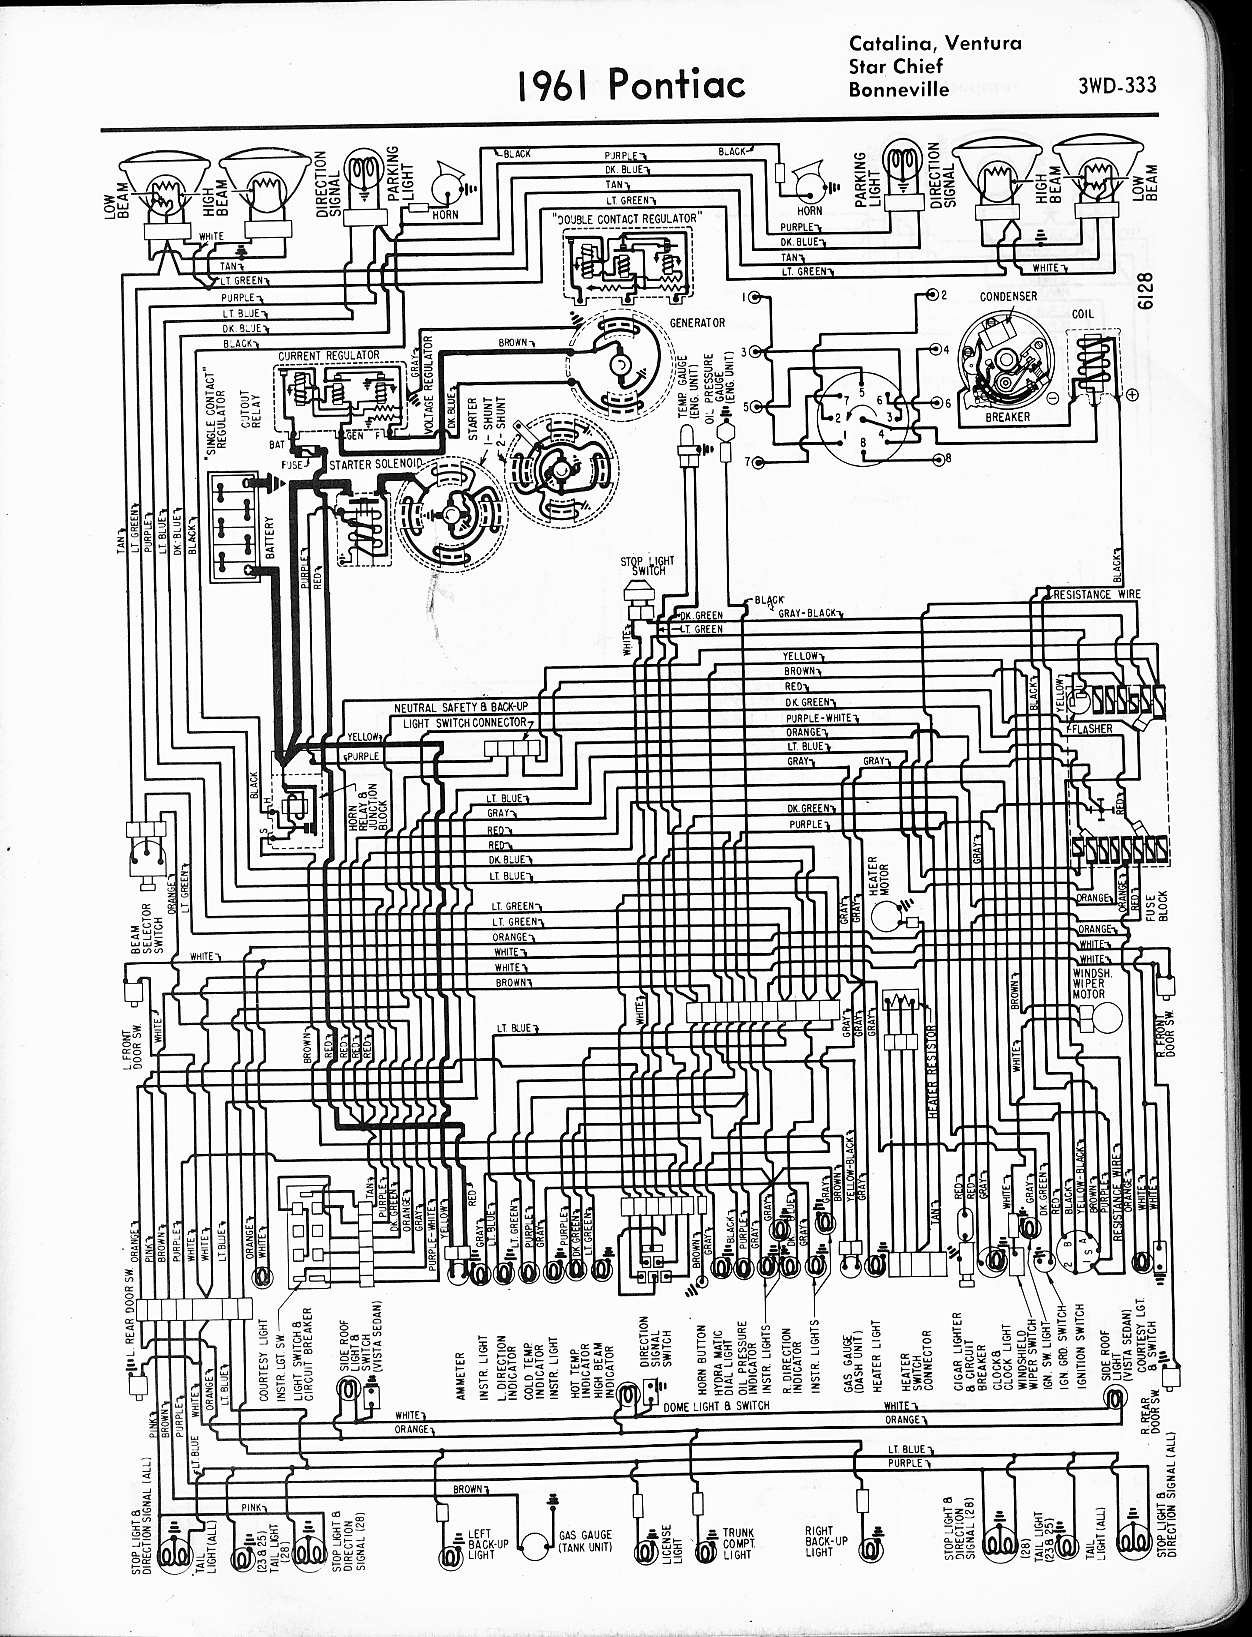 2006 pontiac g6 car stereo radio wiring diagram 1995 ford 7 3 diesel fuel system 1960 schematic toyskids co 1957 1965